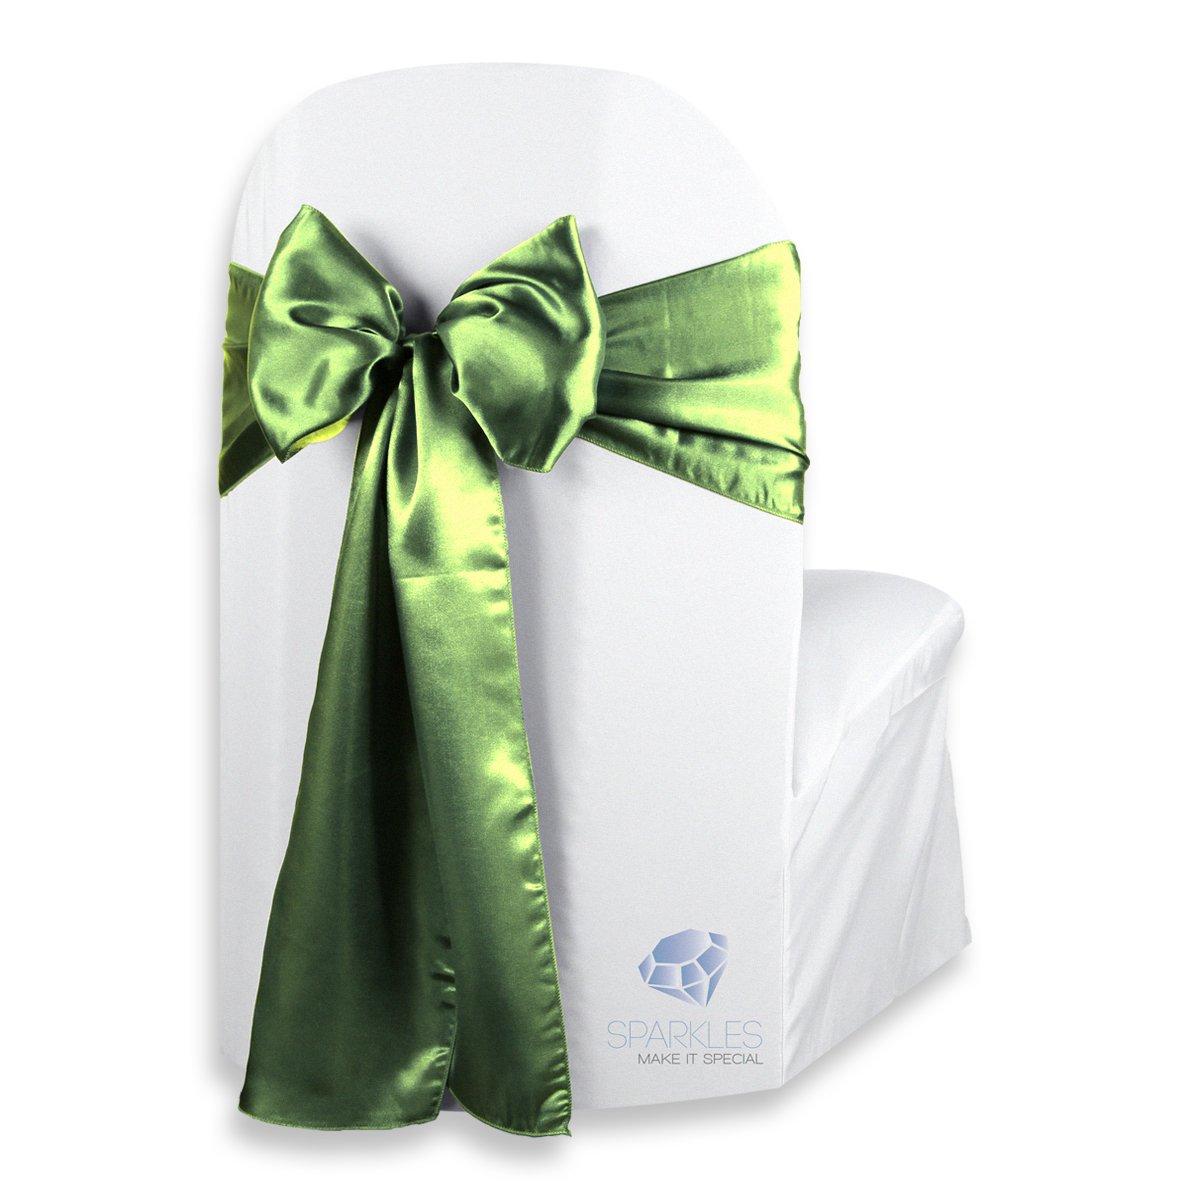 Sparkles Make It Special 10個108 x 8インチサテン椅子カバー弓ウェディングサッシセージグリーン B019XWSQLK